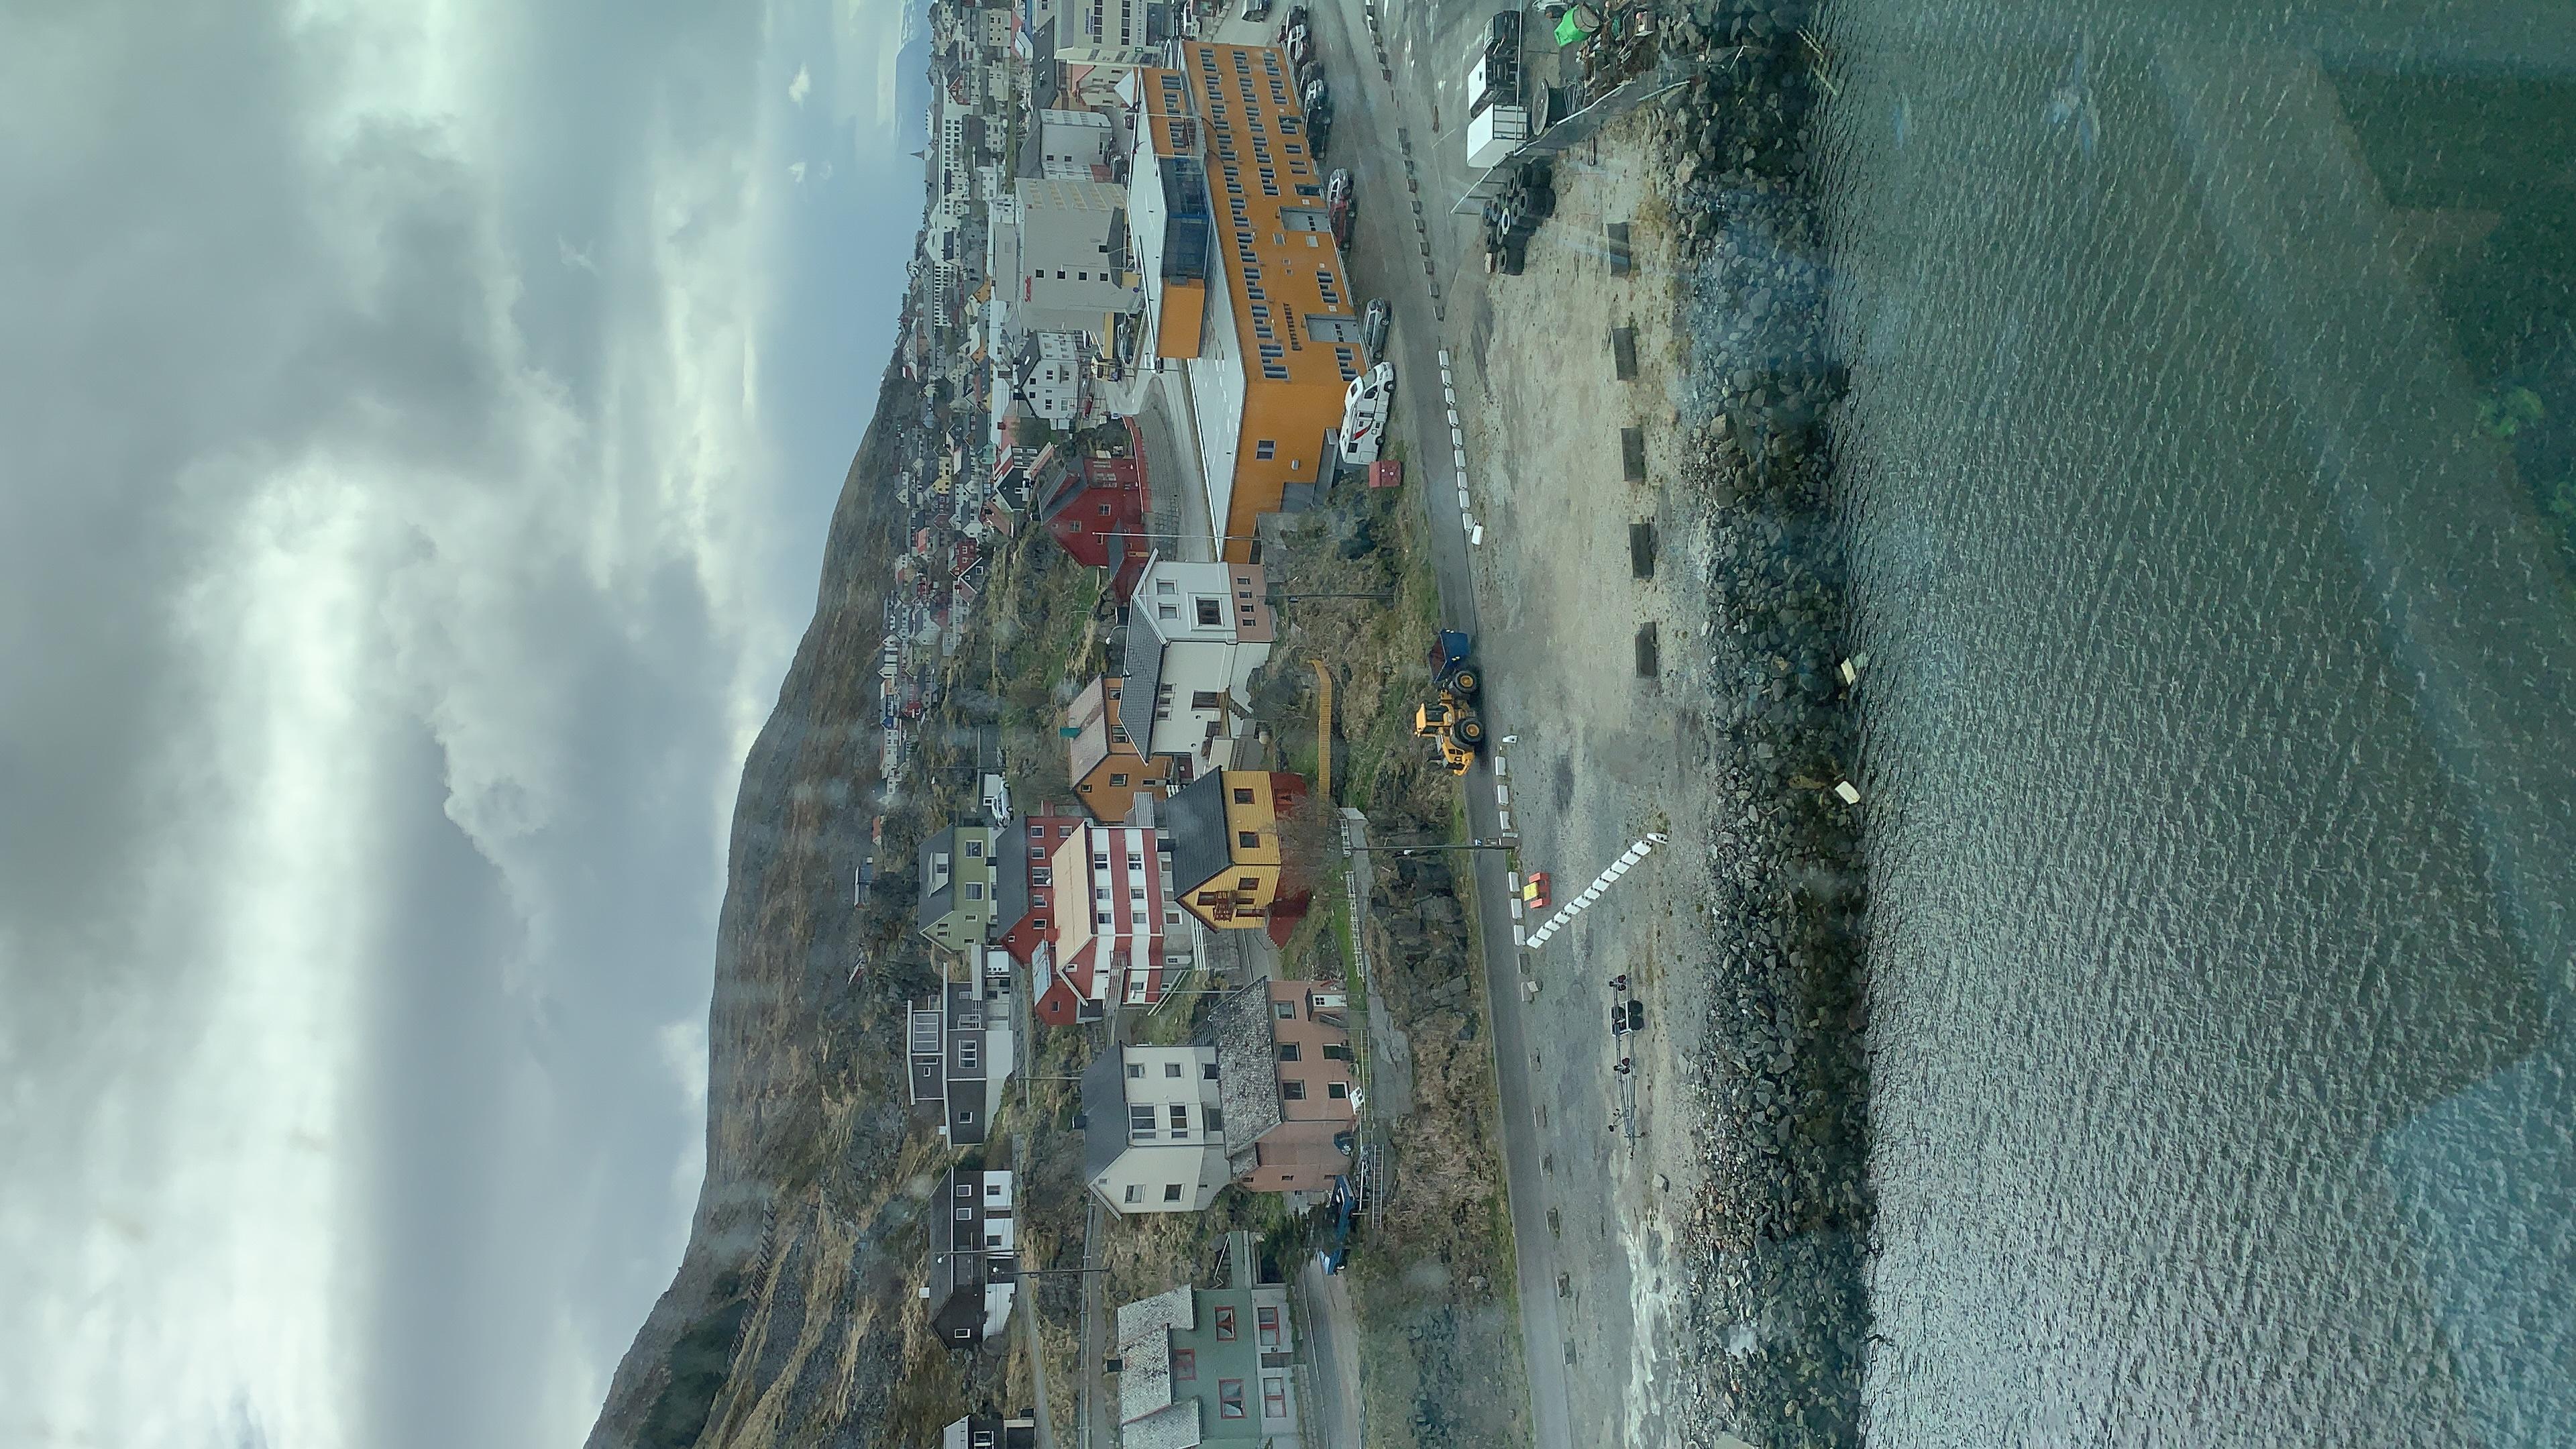 Tag 06: Honningsvåg und Nordkapp